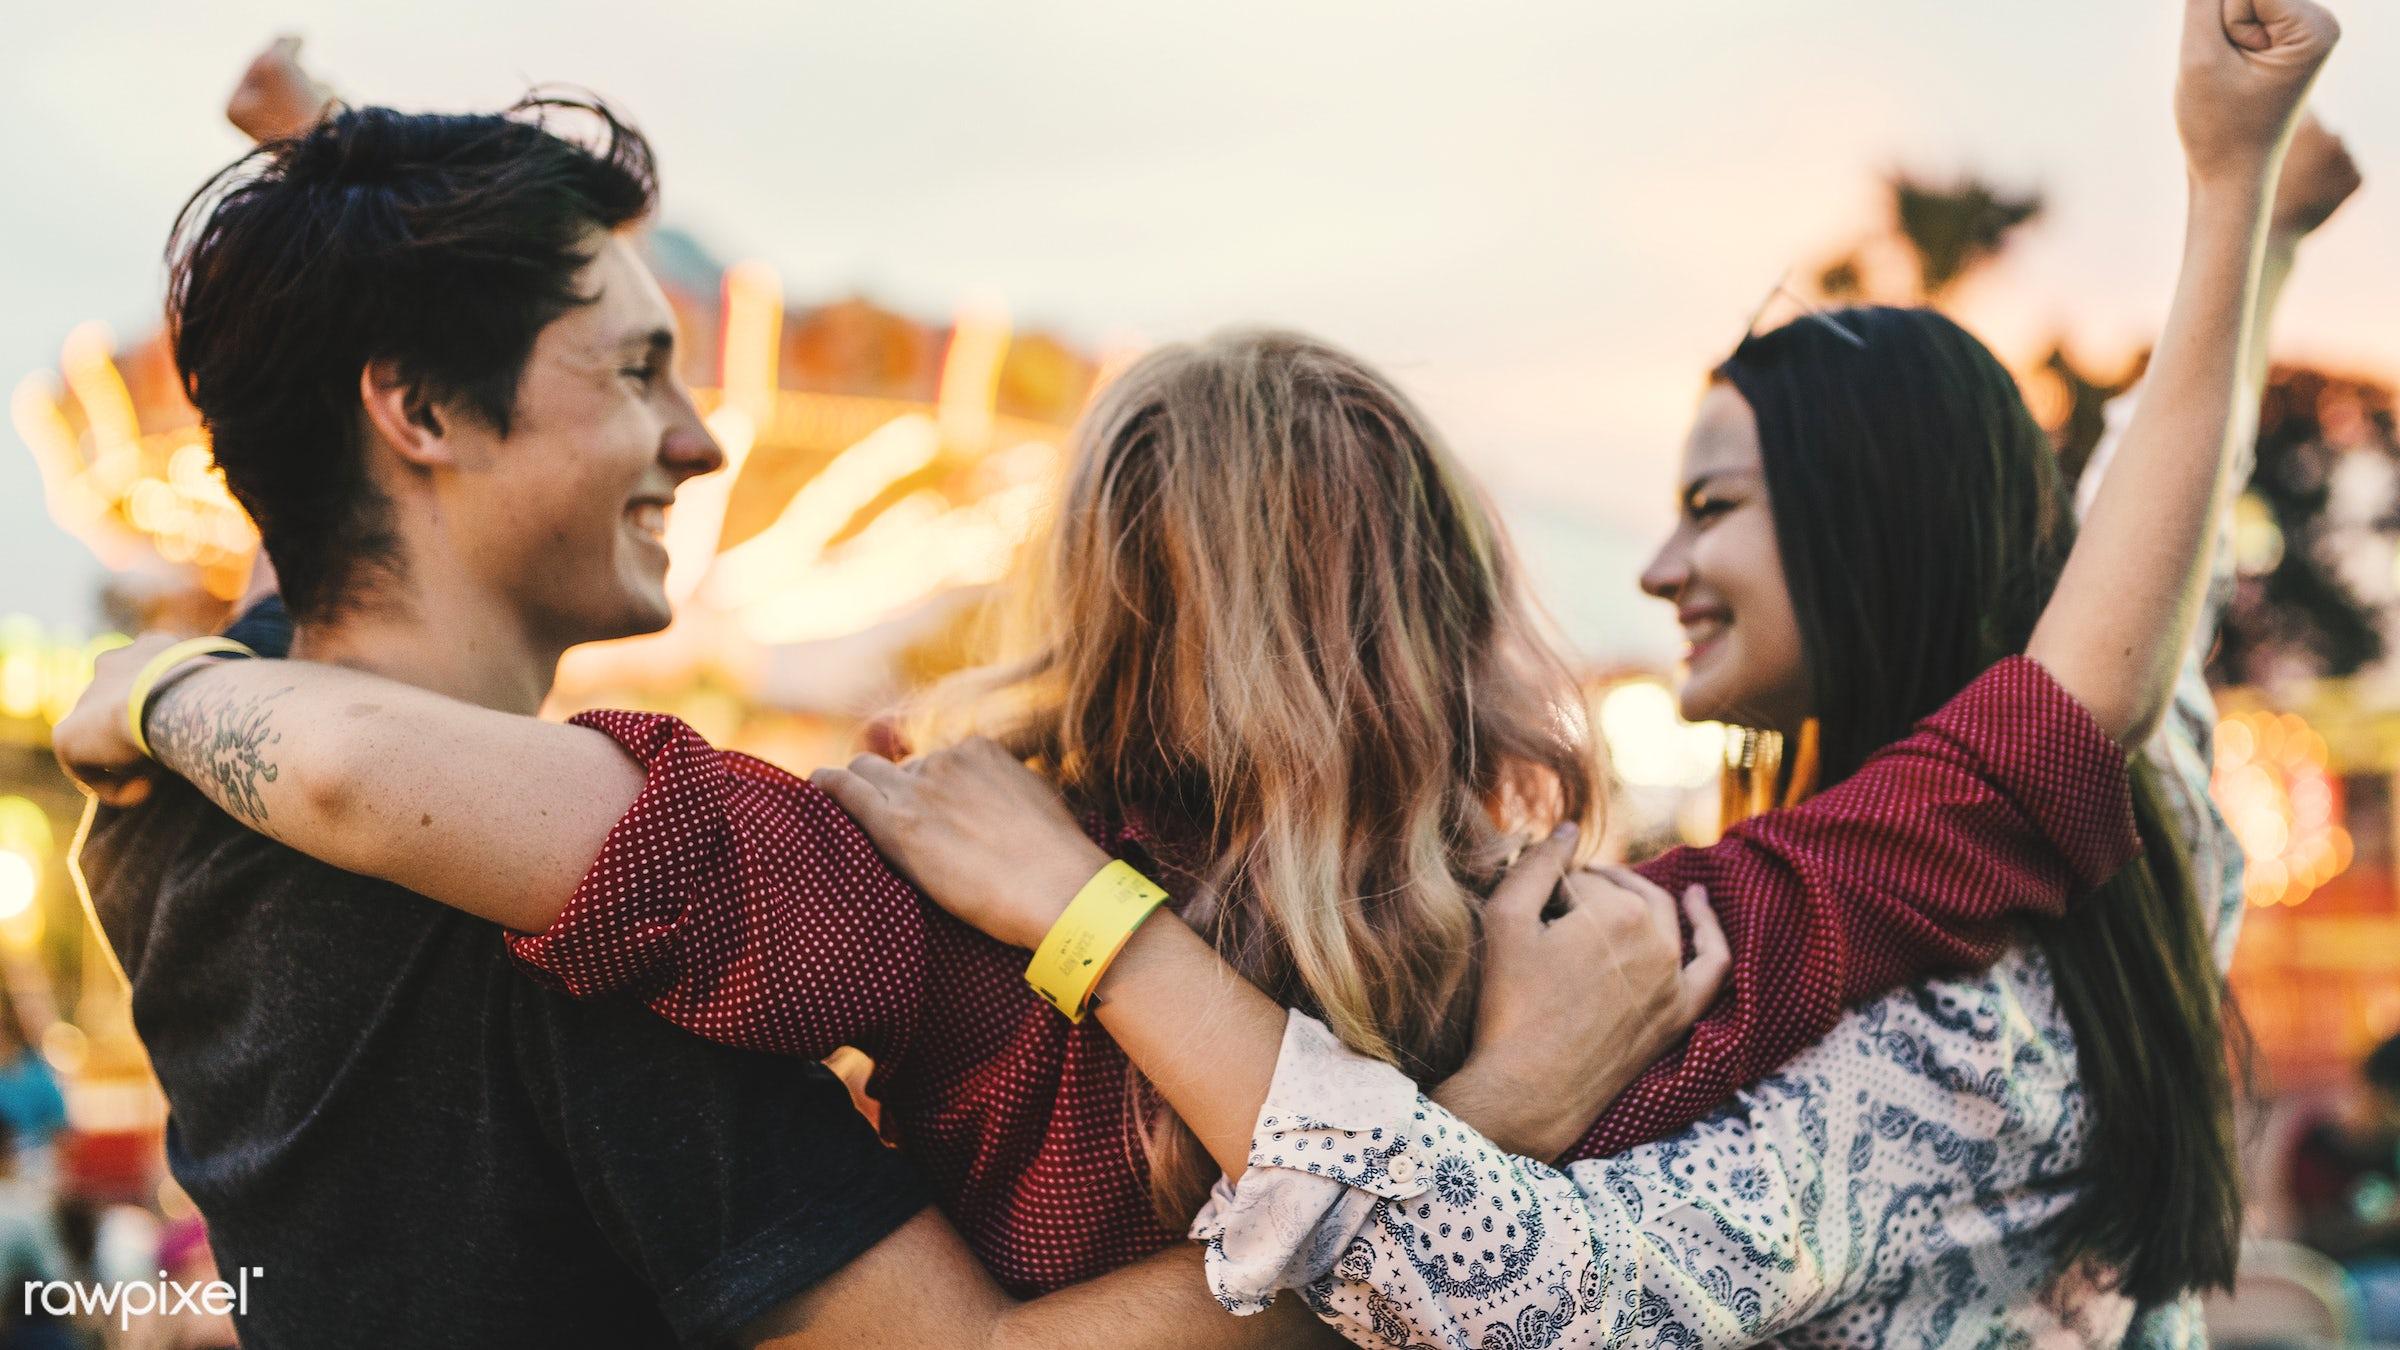 A group of friends is enjoying the amusement park - amusement park, enjoyment, expression, feeling, friends, friendship, fun...